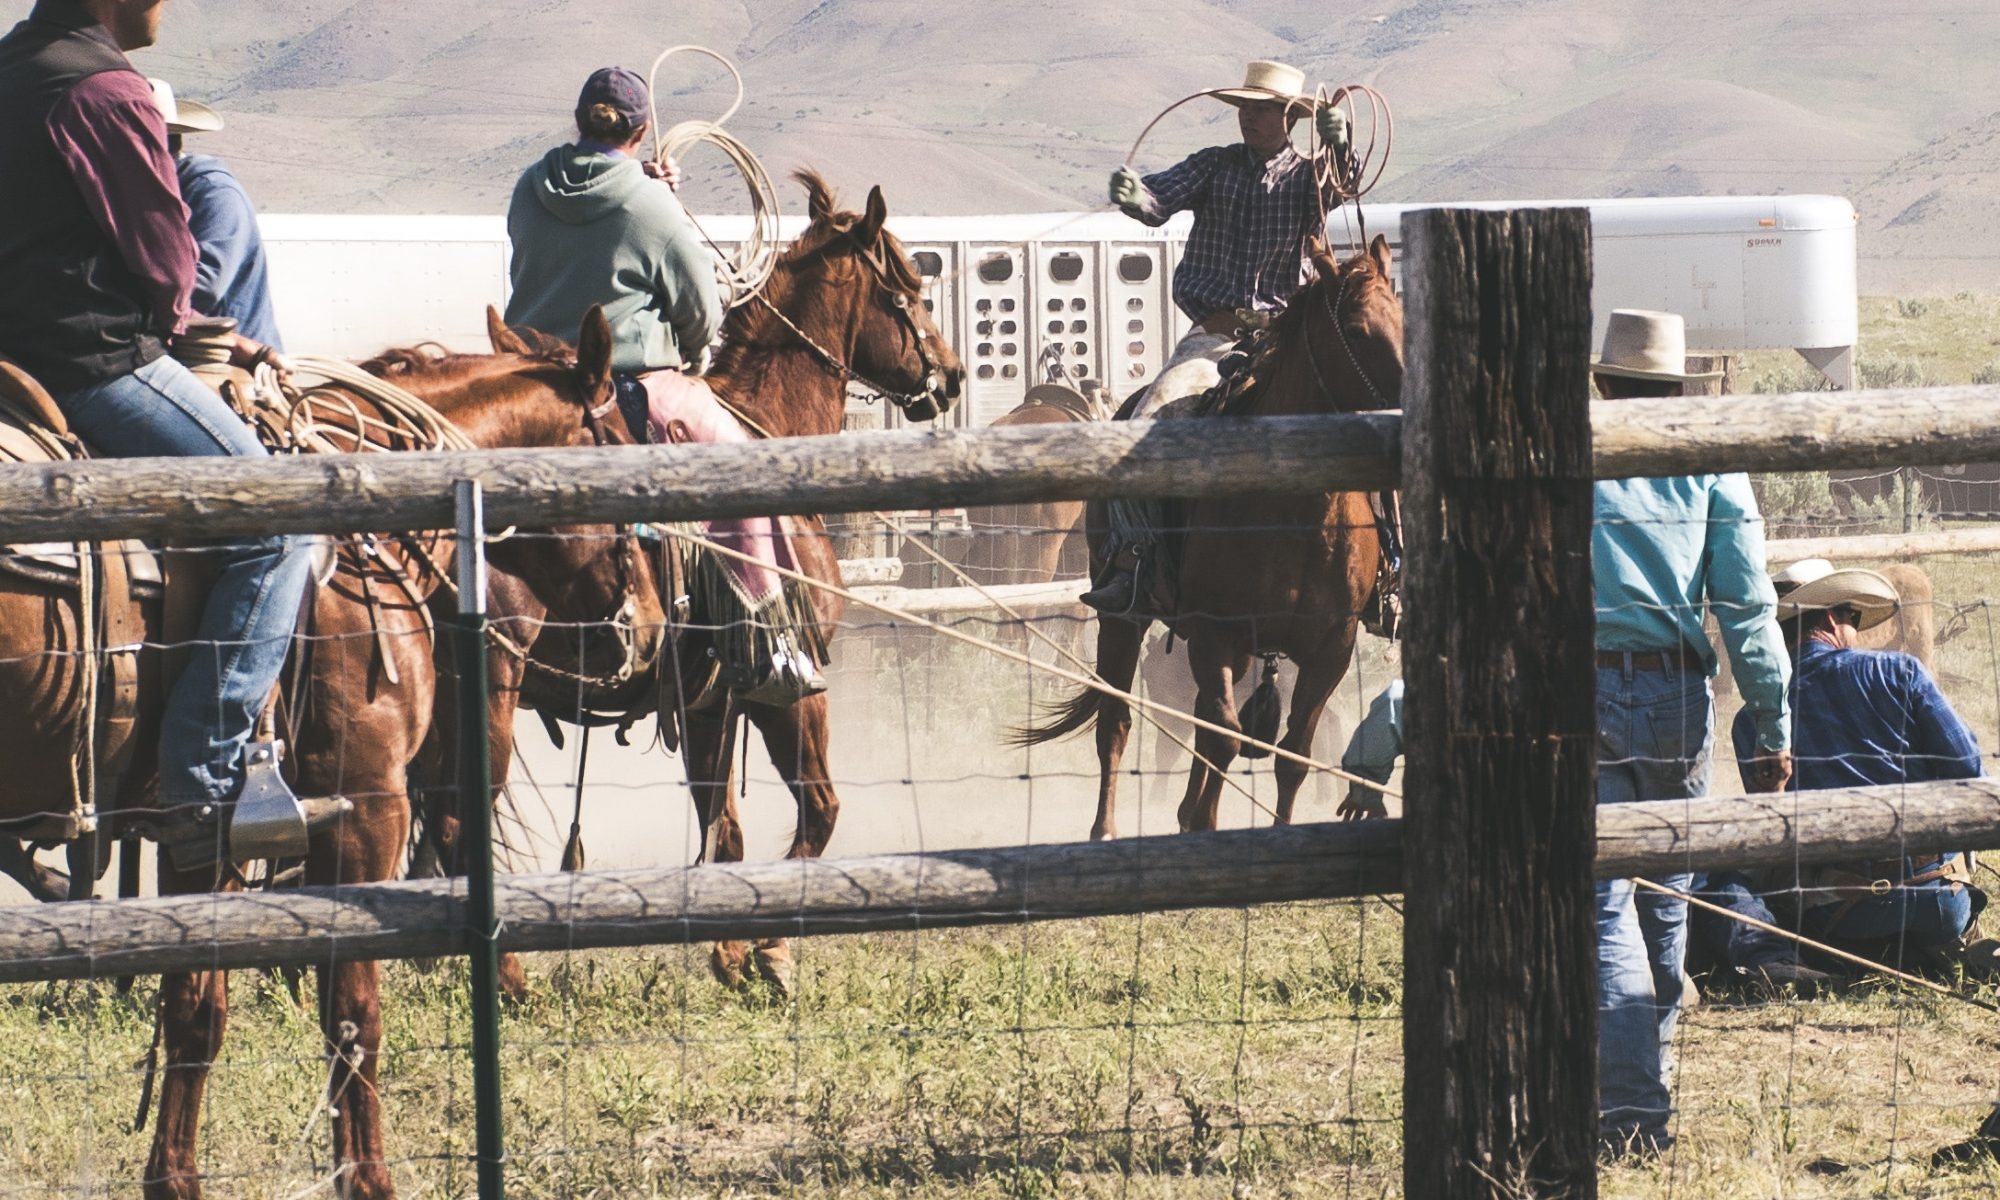 Cowboy Chaplains of America